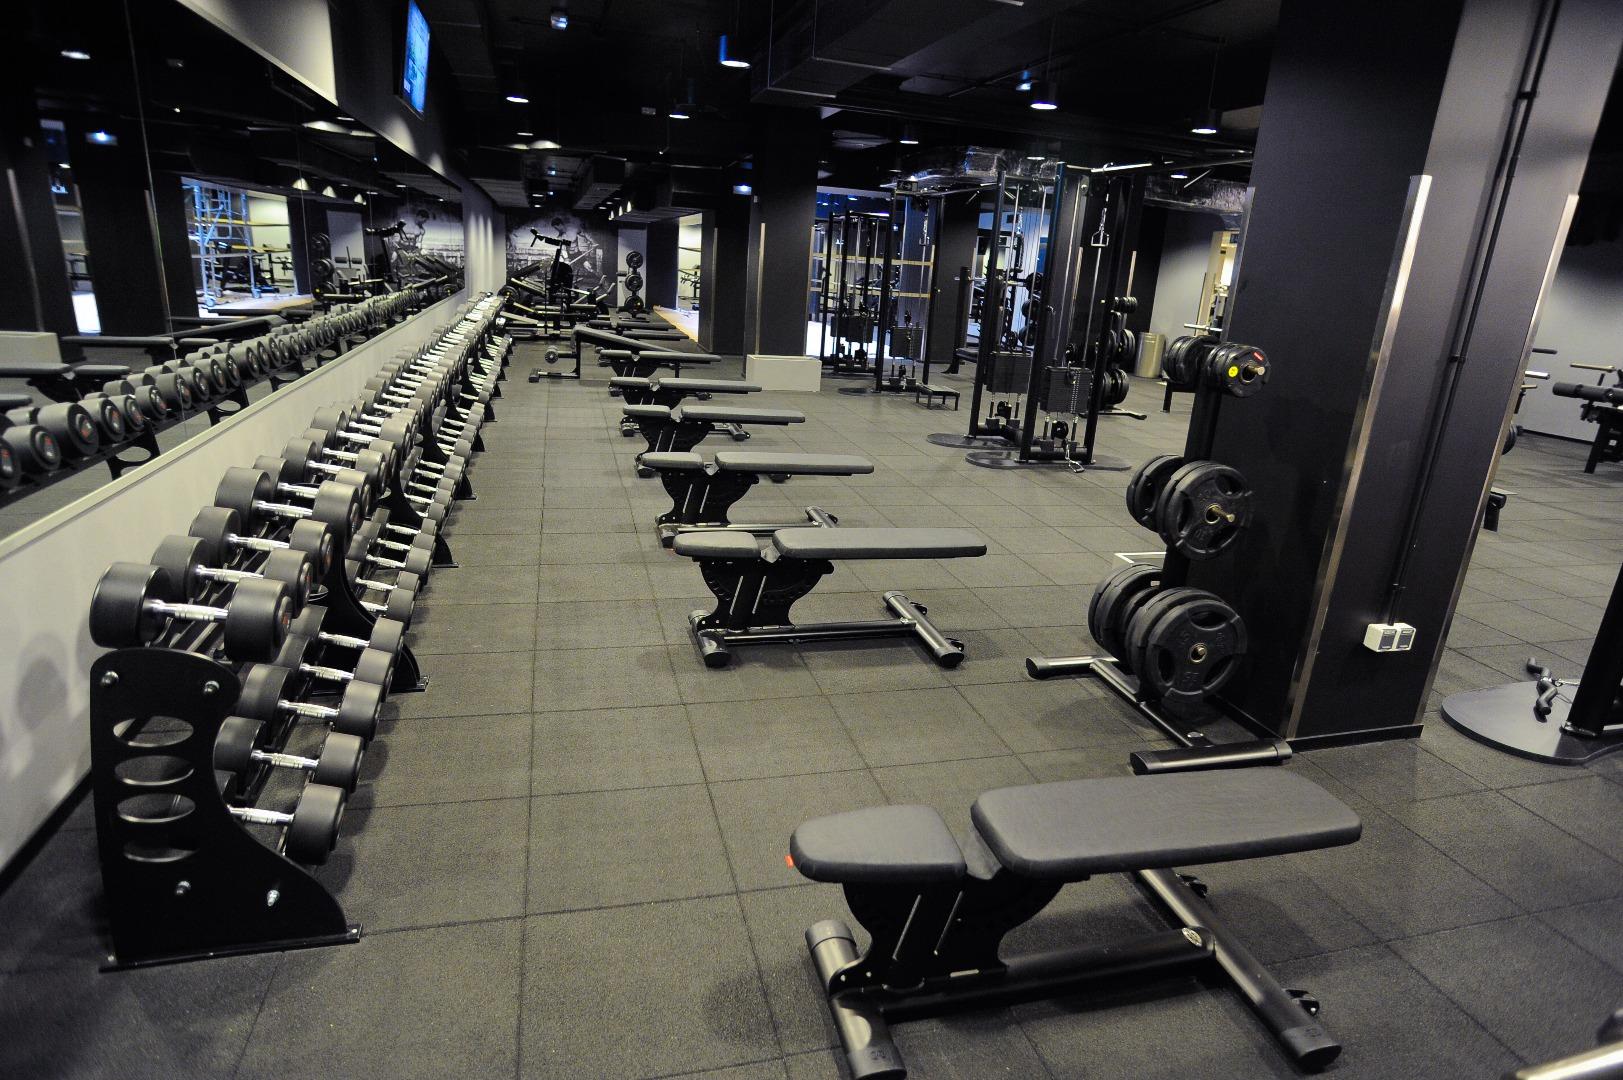 Picture 0 Deals for Gym McFIT Hospitalet - C.C La Farga L'Hospitalet de Llobregat